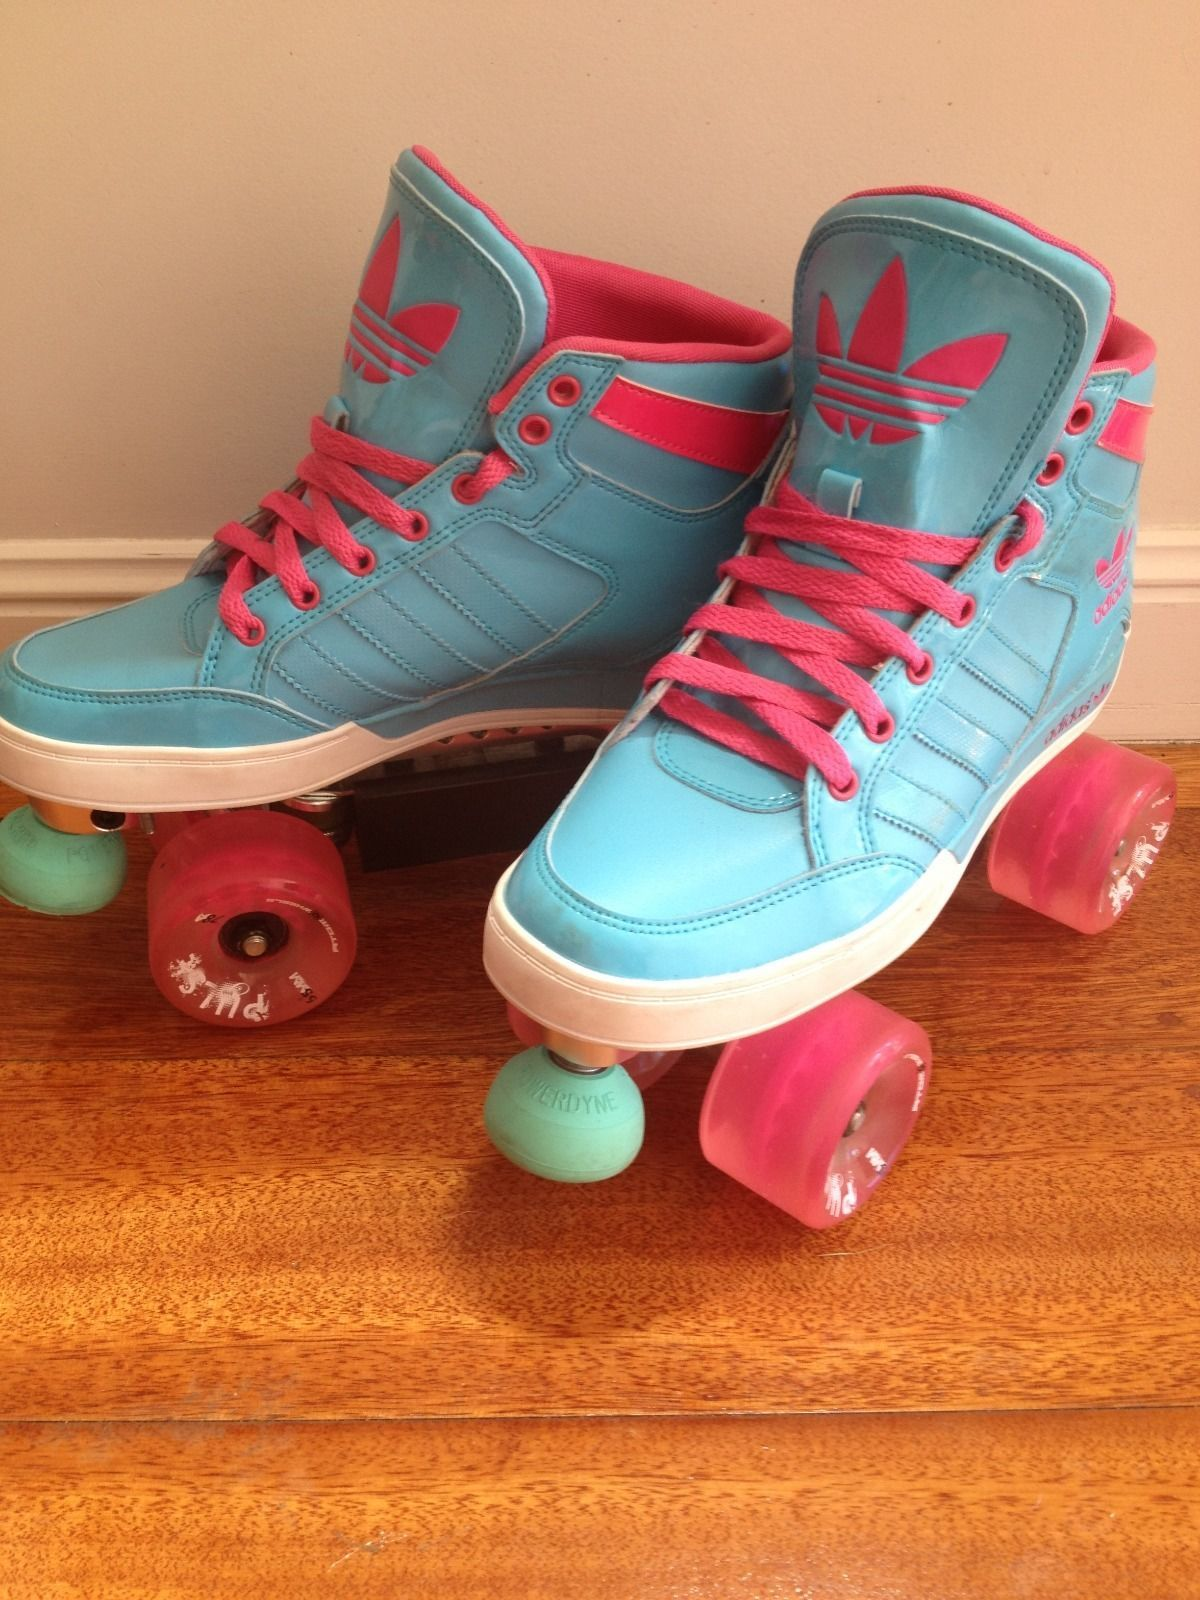 Roller shoes london - Custom Adidas Roller Skates Mounted On Revenge Plates All Terrain Pulse 78a Wheels Bones